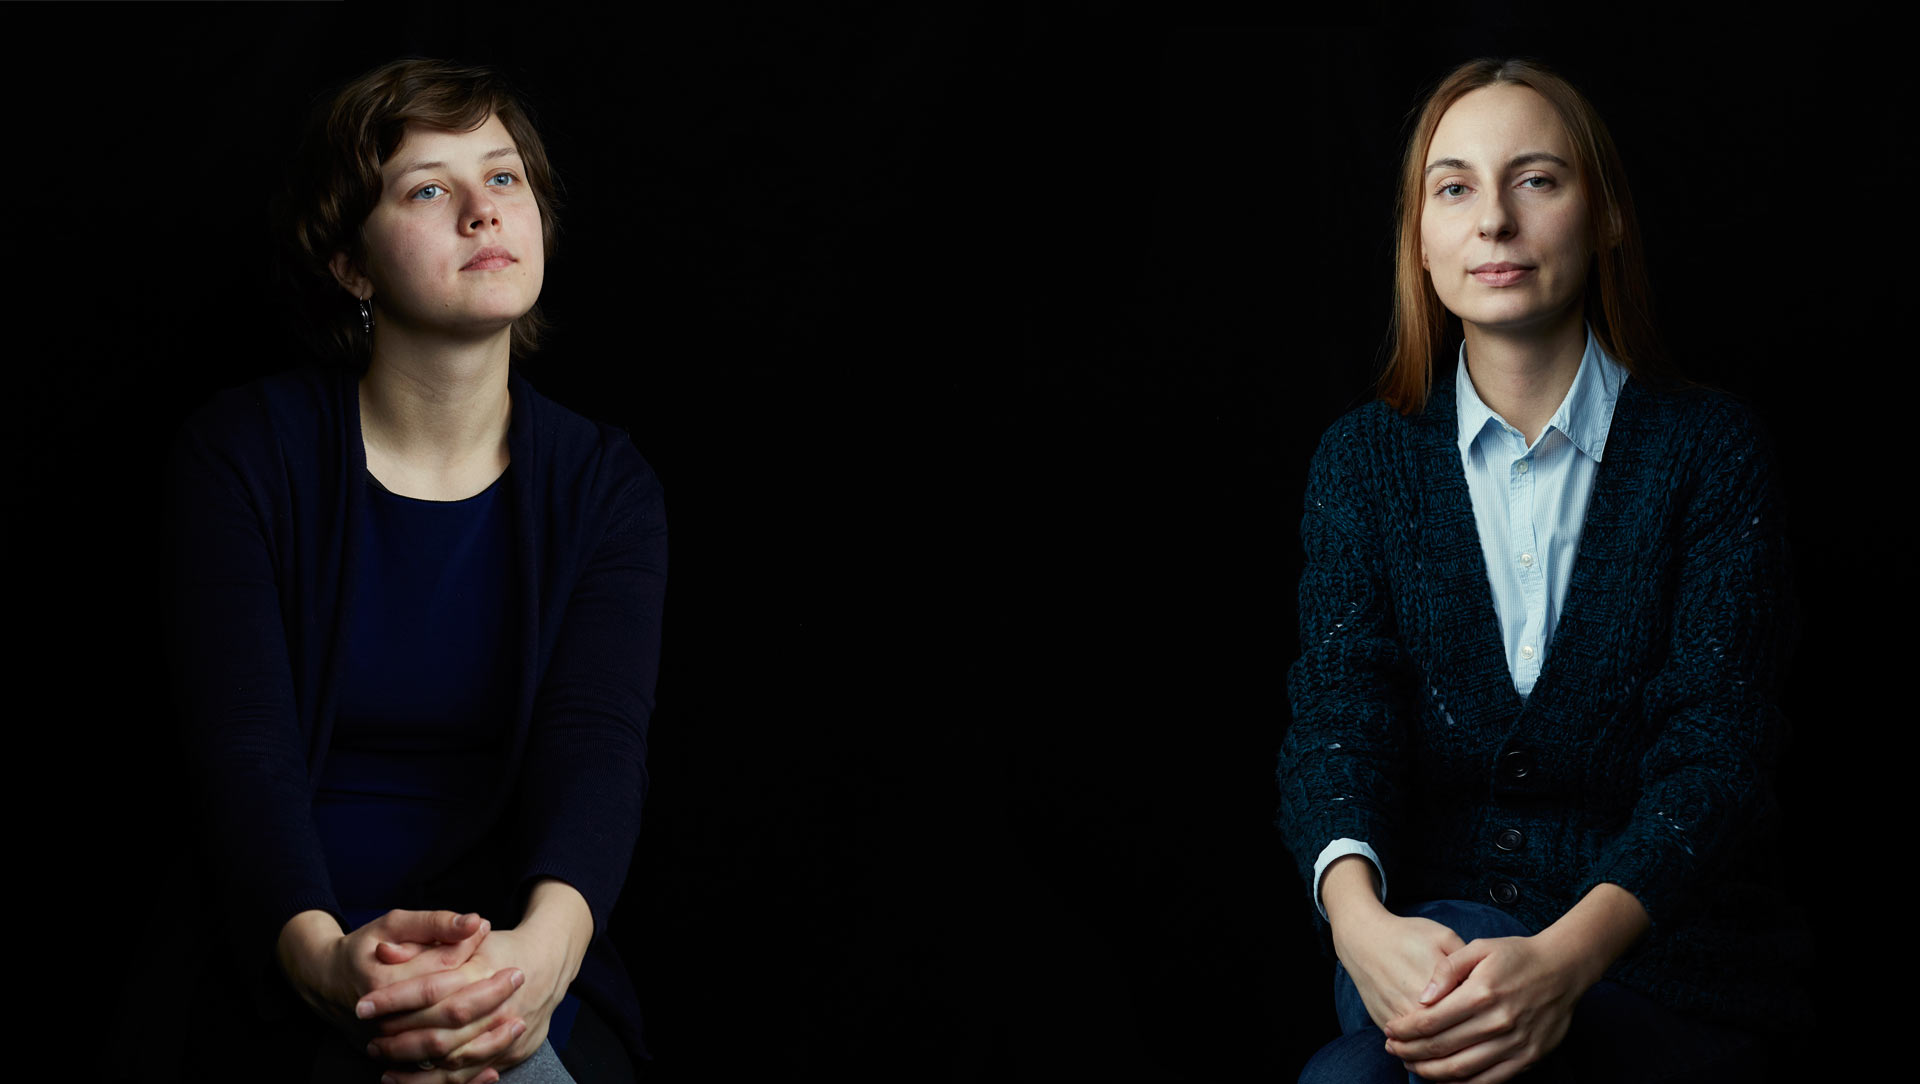 Лиза Сурганова и Ирина Юзбекова